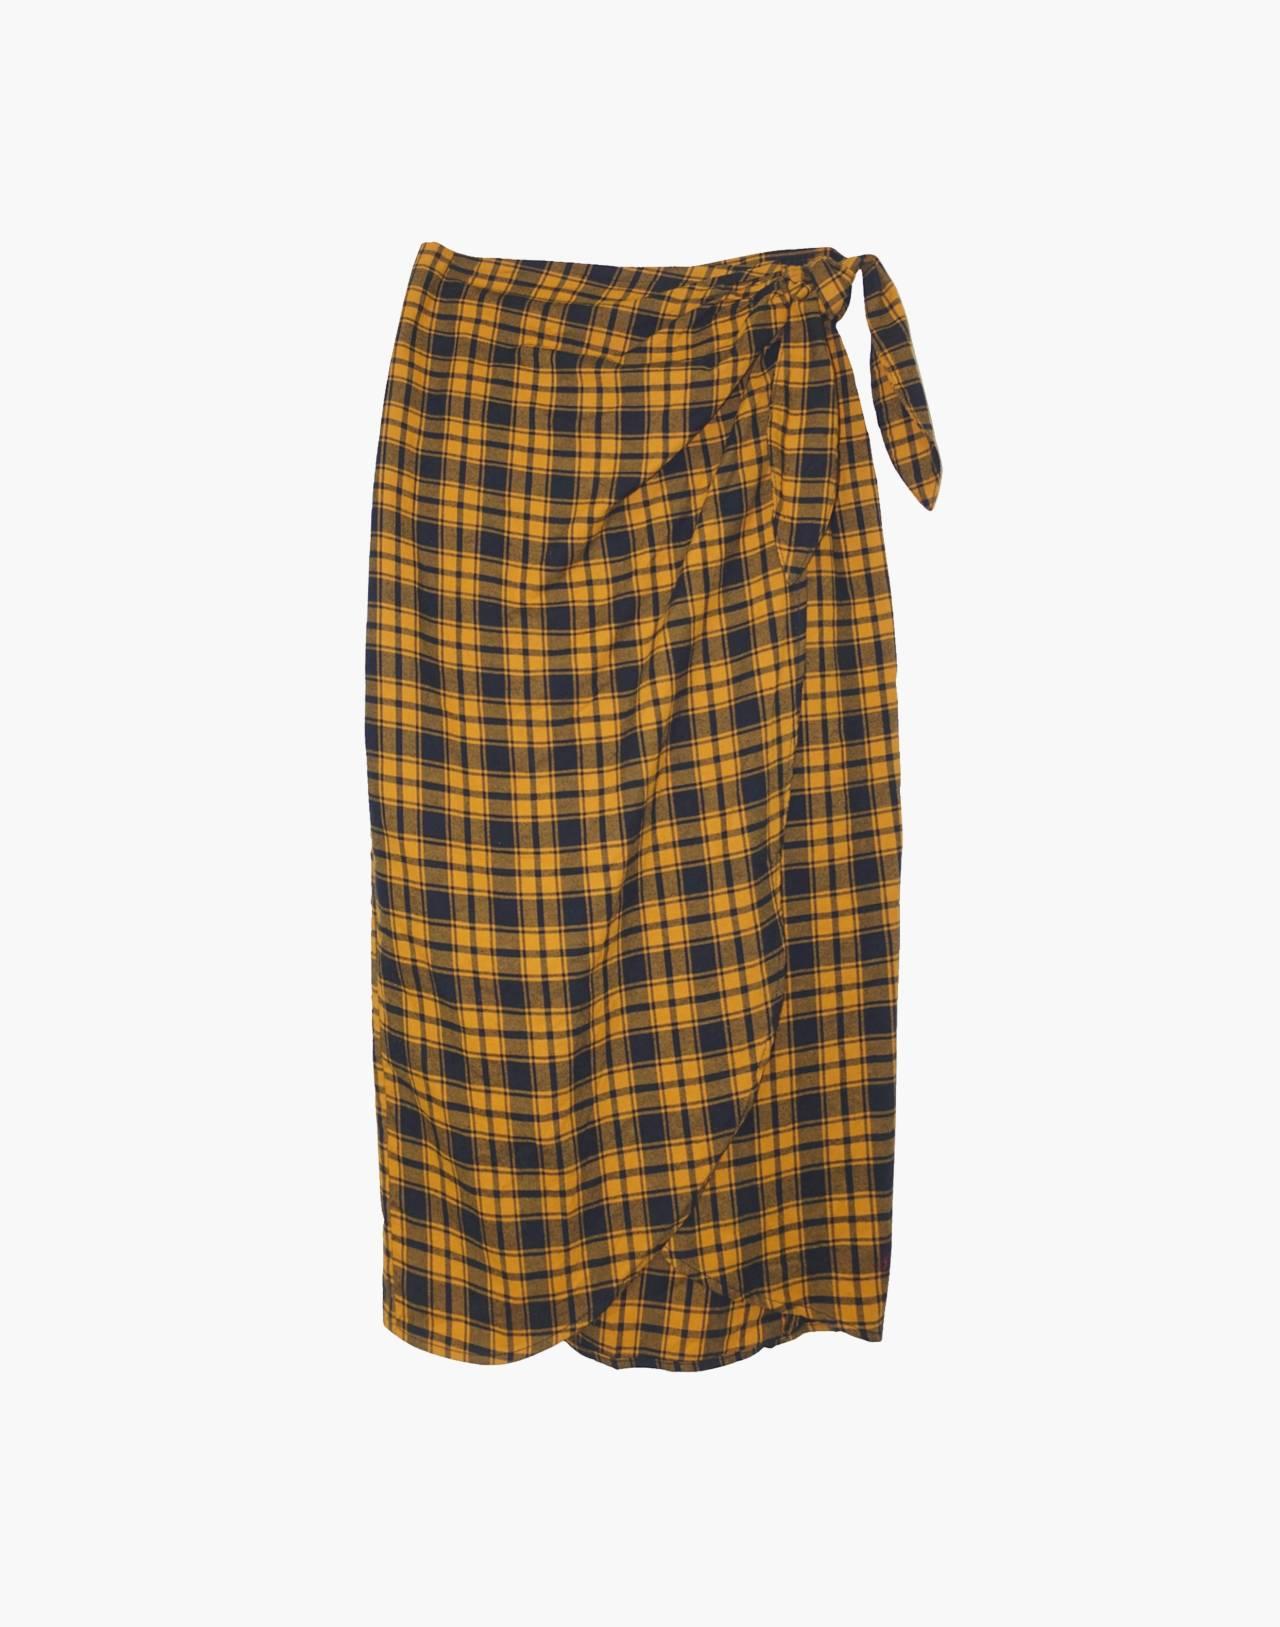 NICO NICO™ Lauper Plaid Wrap Skirt in yellow image 1